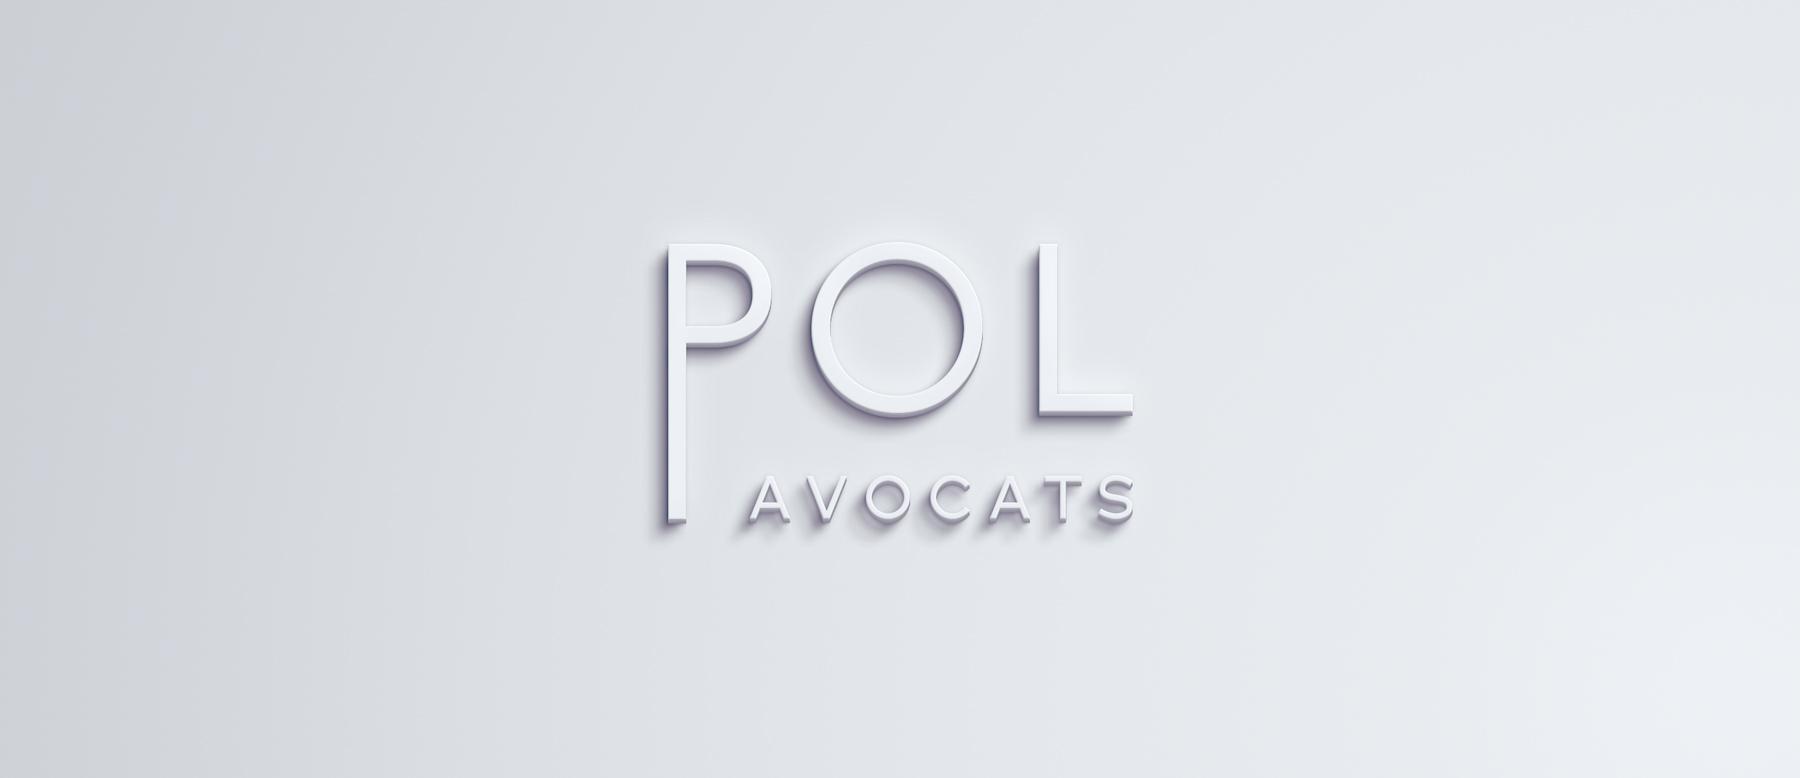 POL Avocats